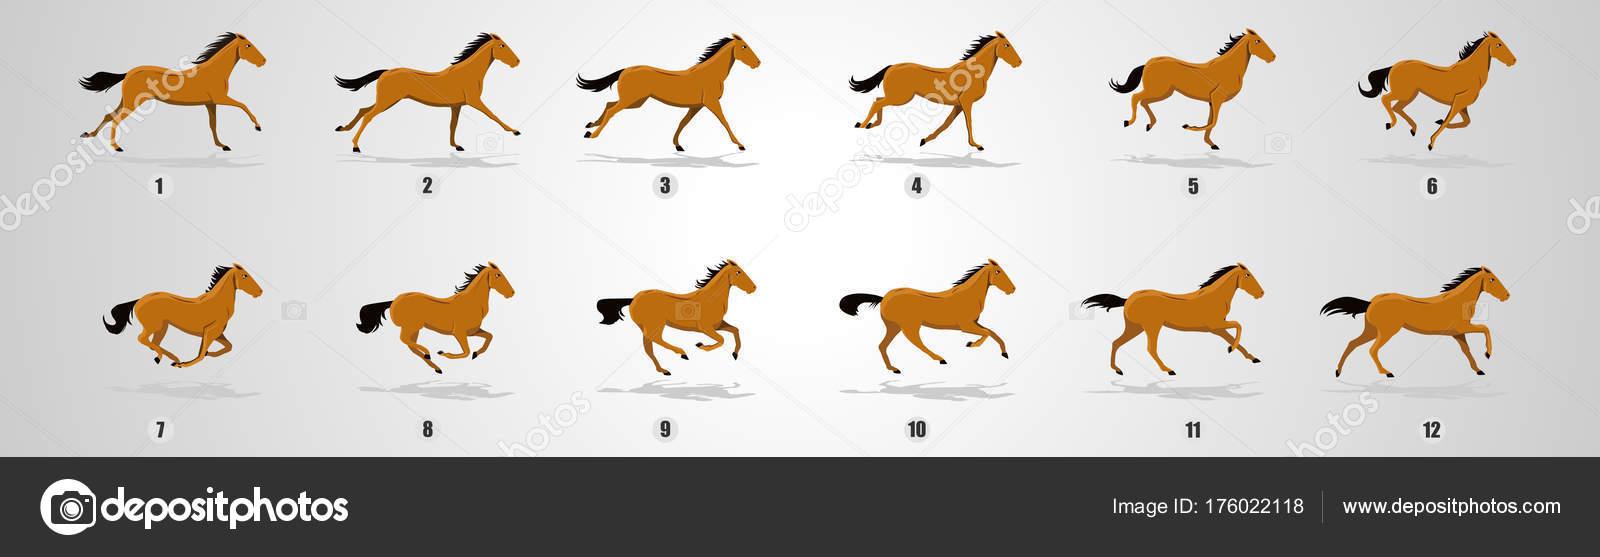 Horse Run Cycle Animation Sprite Sheets Jokey Run Cycle Loop — Stock ... for Animation Horse Running  303mzq